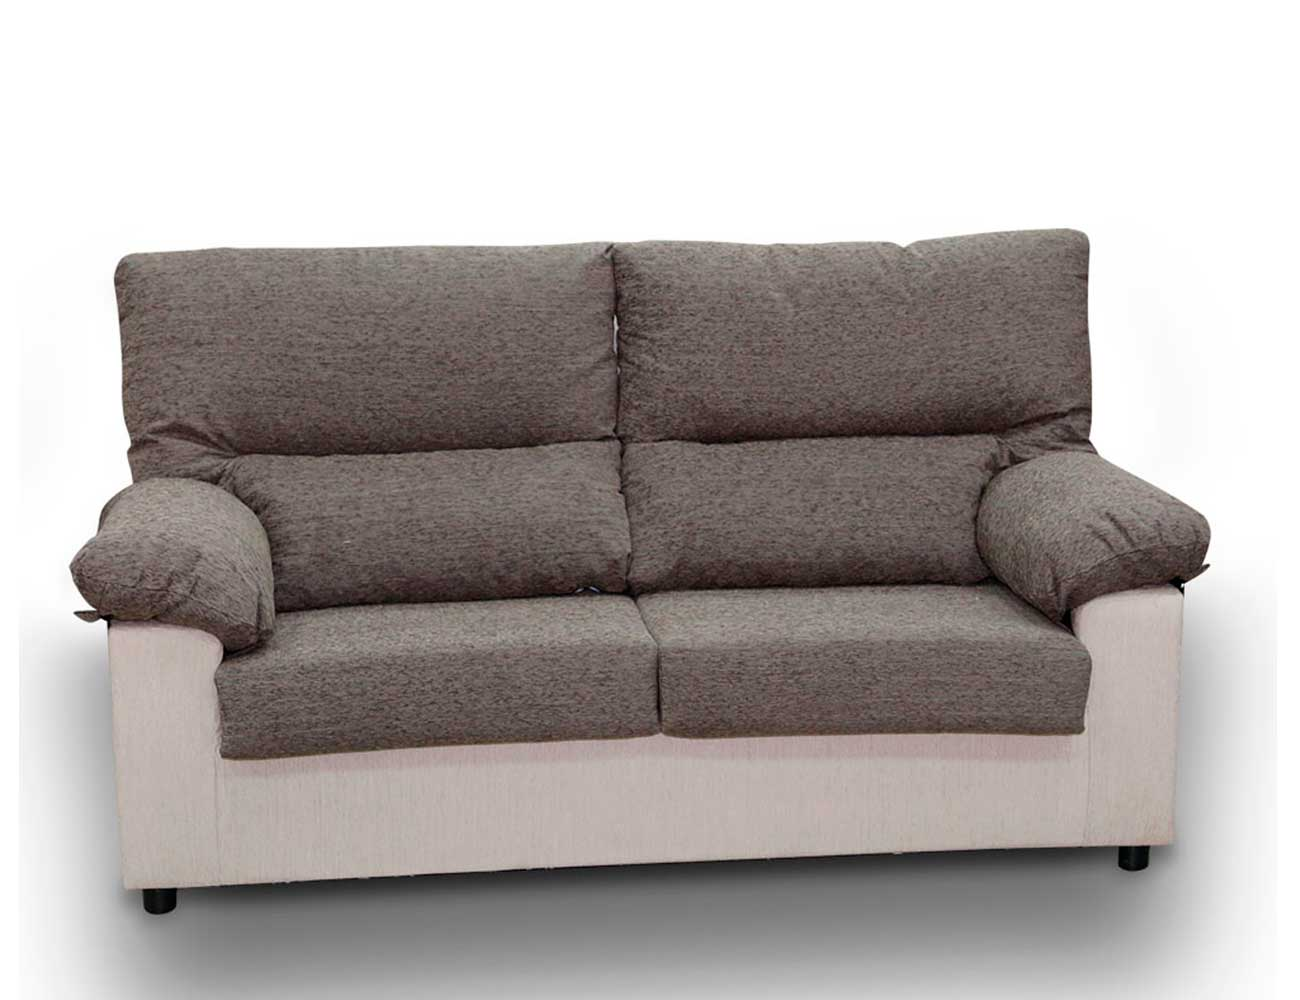 Sofa 3 plazas barato25